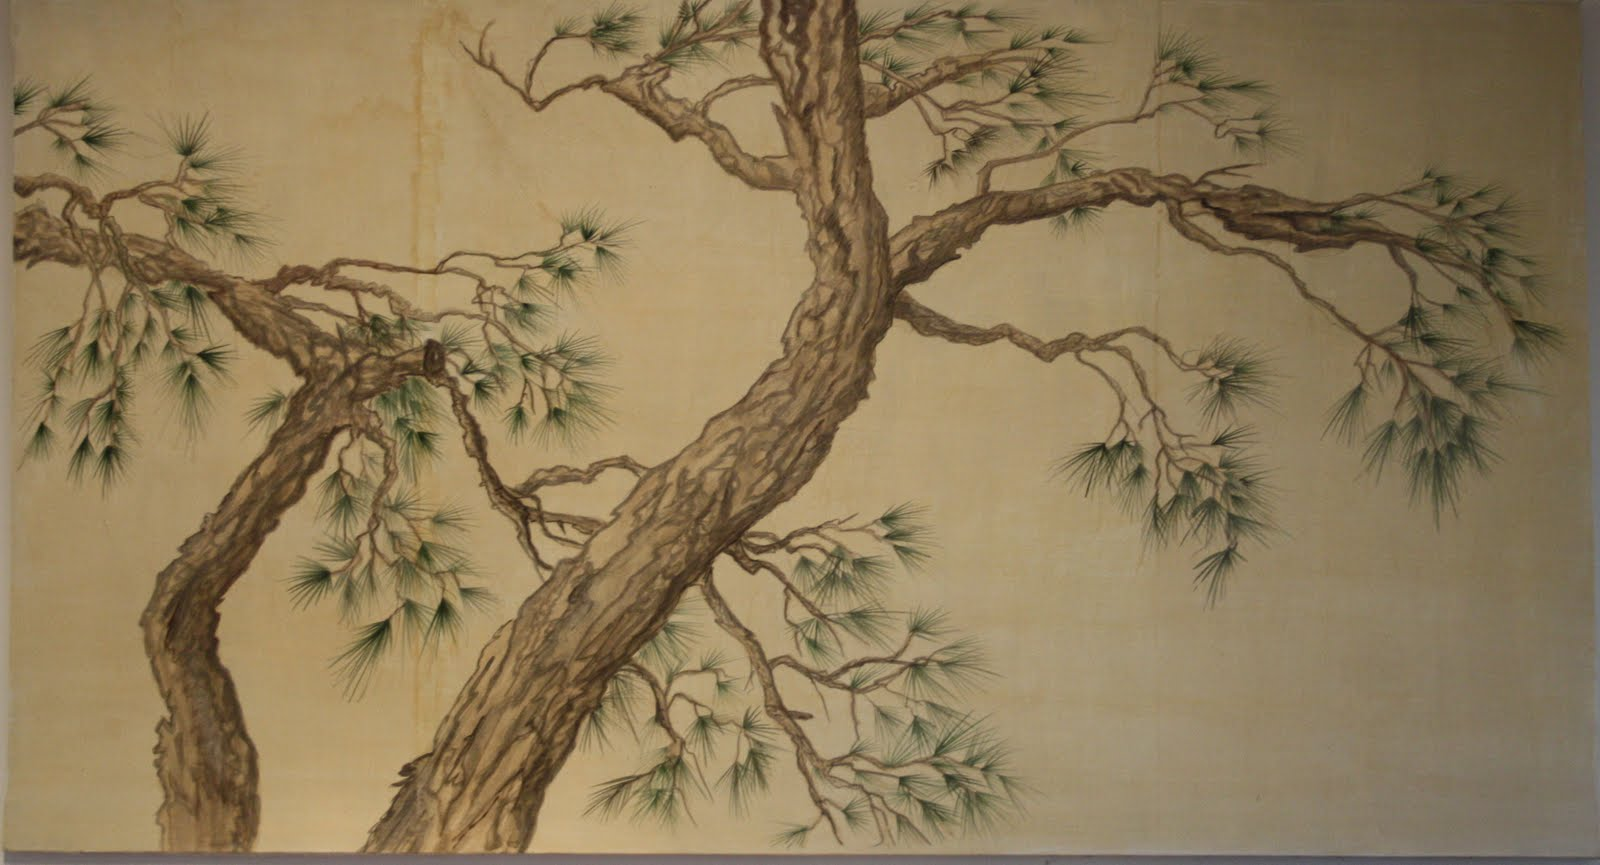 Pittura giapponese barbara gallas for Pittura salone